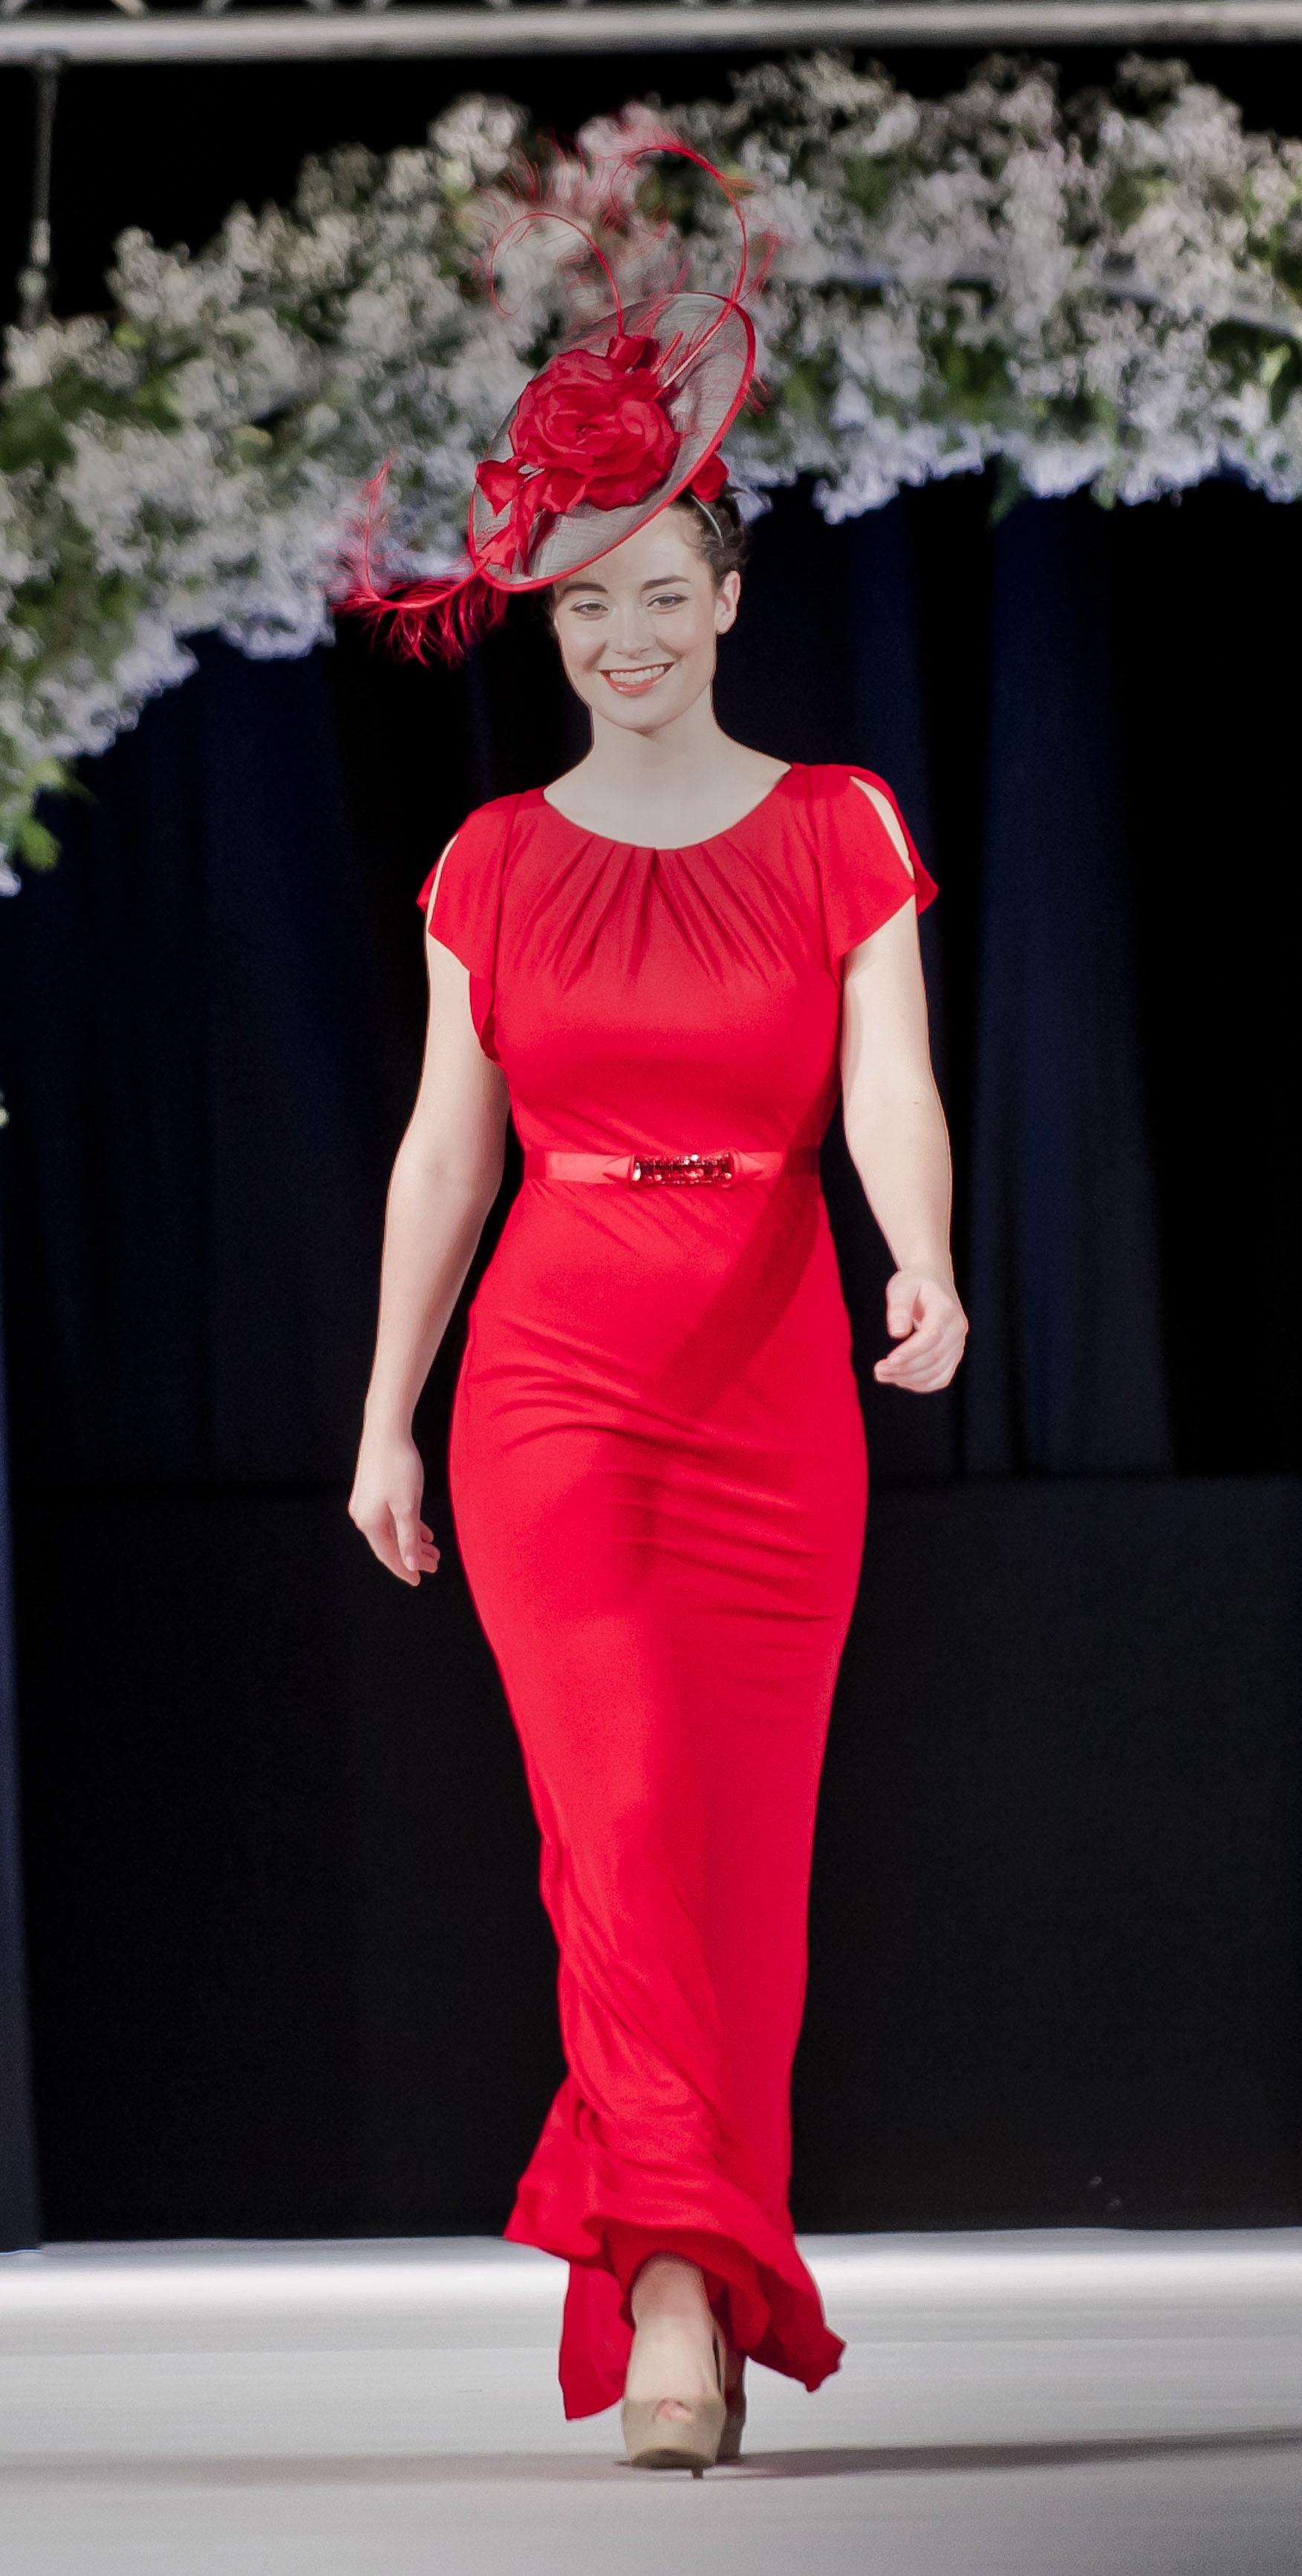 Scottish Wedding Show Catwalk - SECC 2014